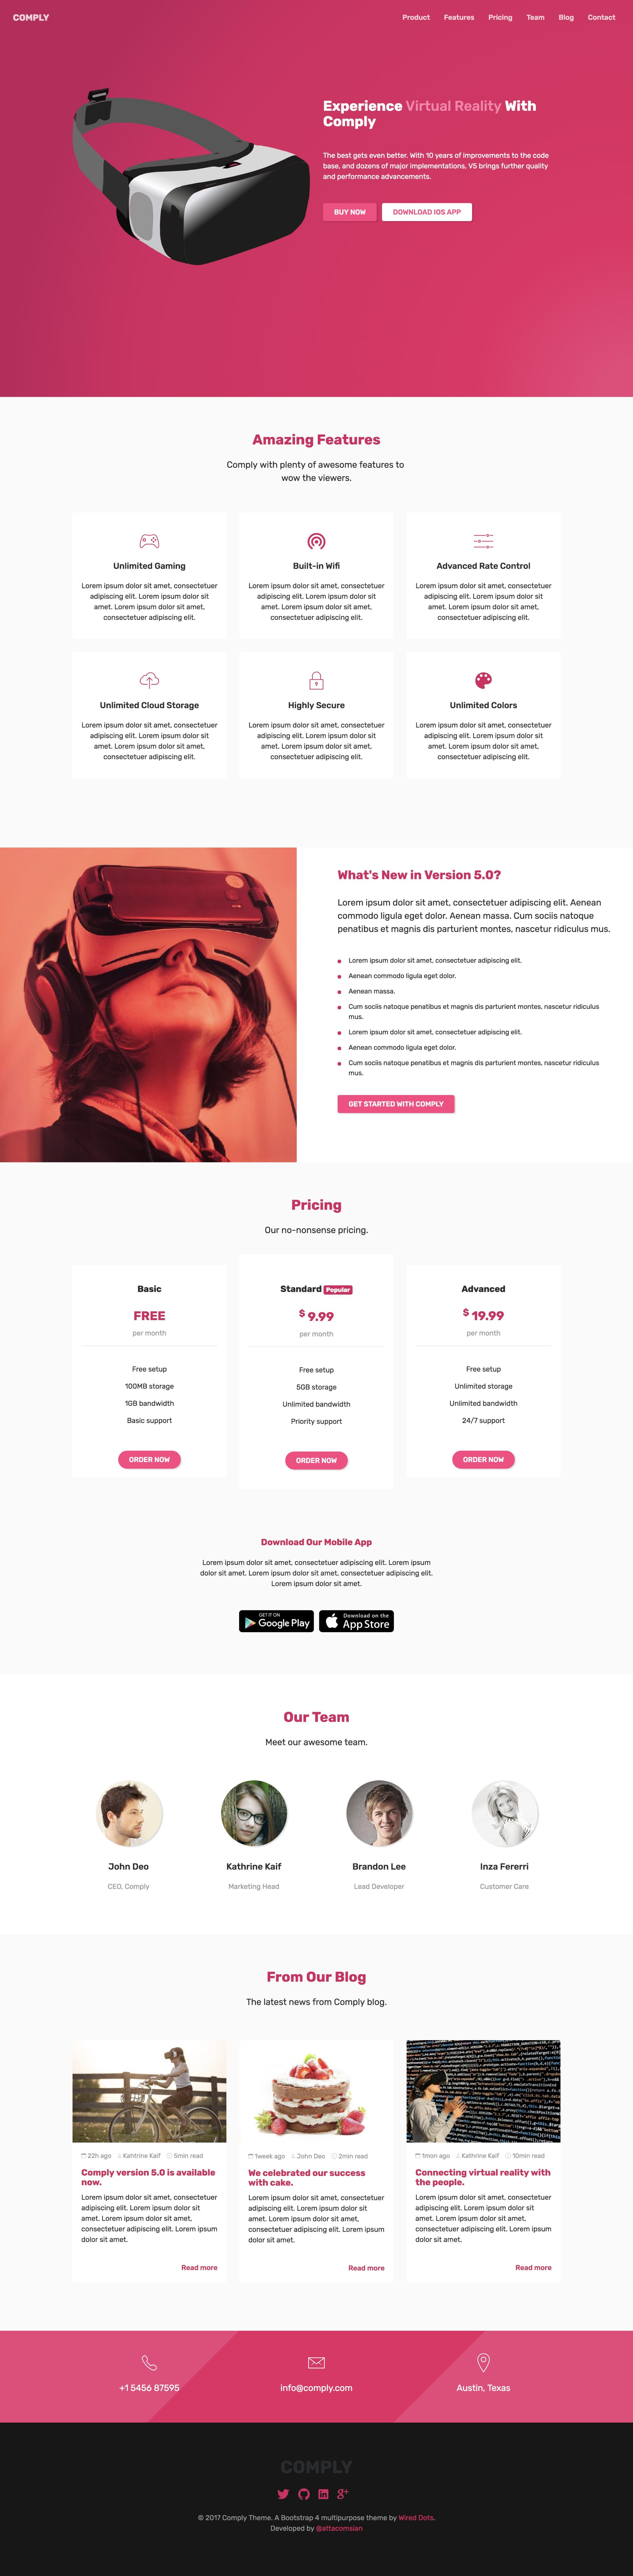 Comply Website Screenshot